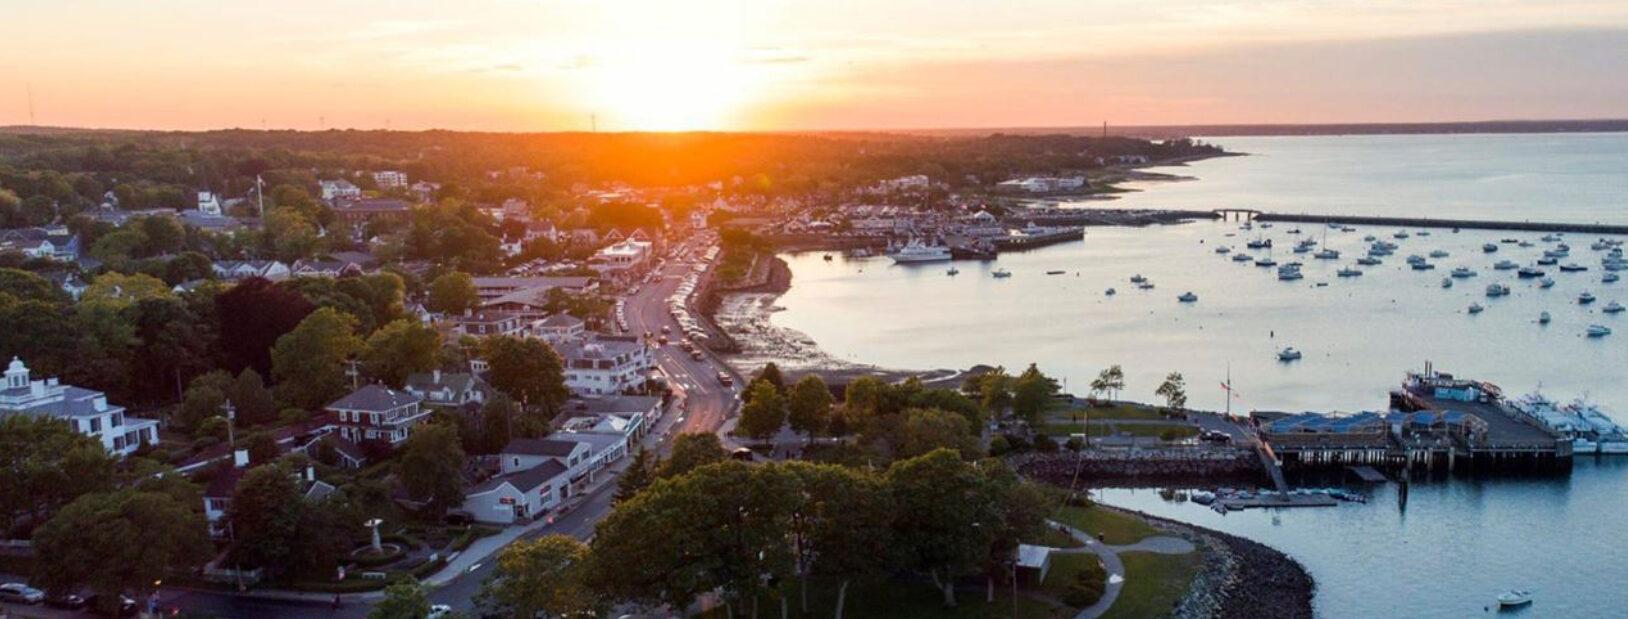 Plymouth Harbor Sunrise